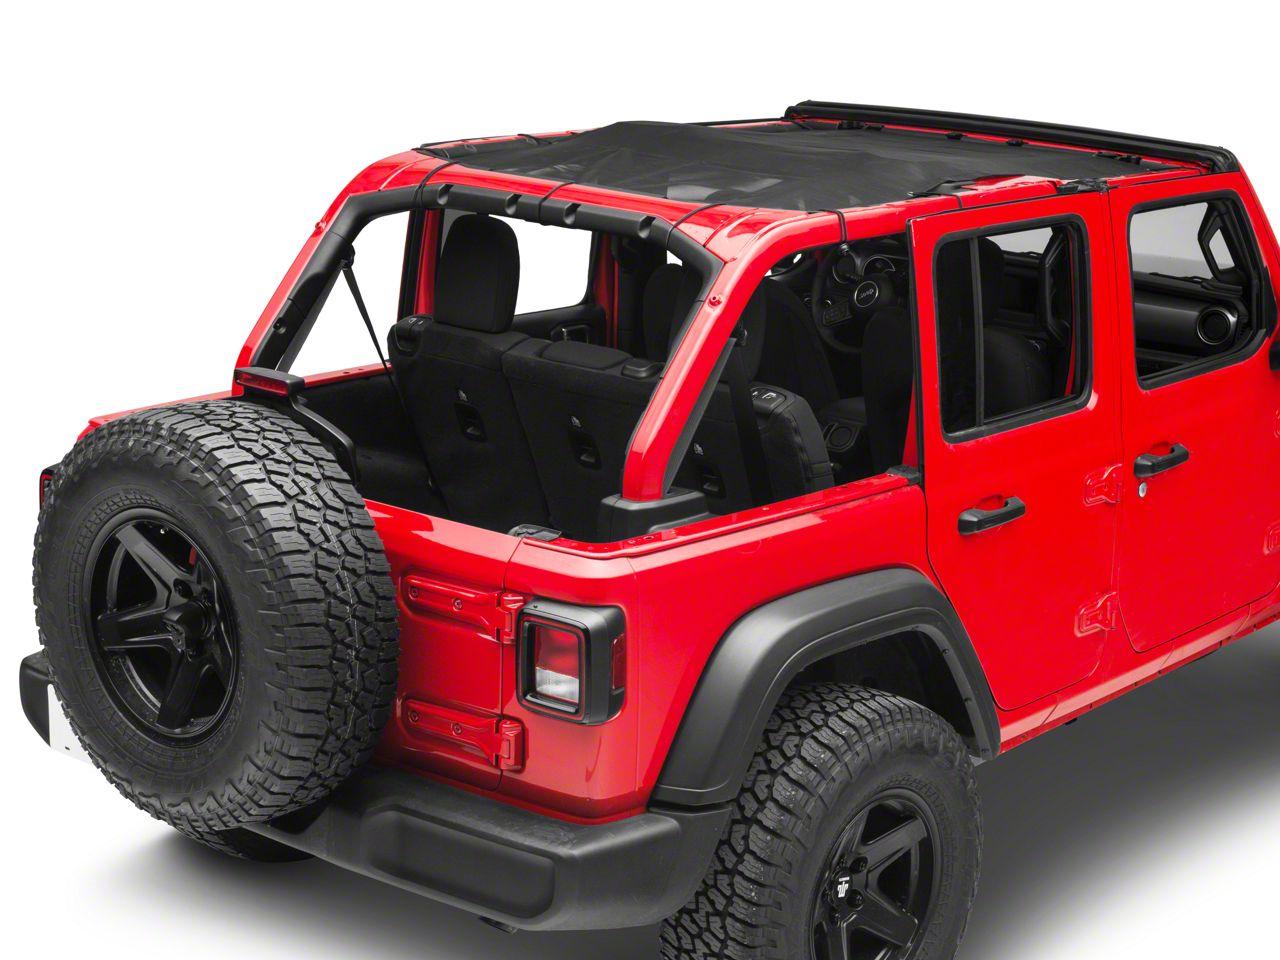 Steinjager Teddy Top Full Length Solar Screen Cover - Black (18-19 Jeep Wrangler JL 4 Door)